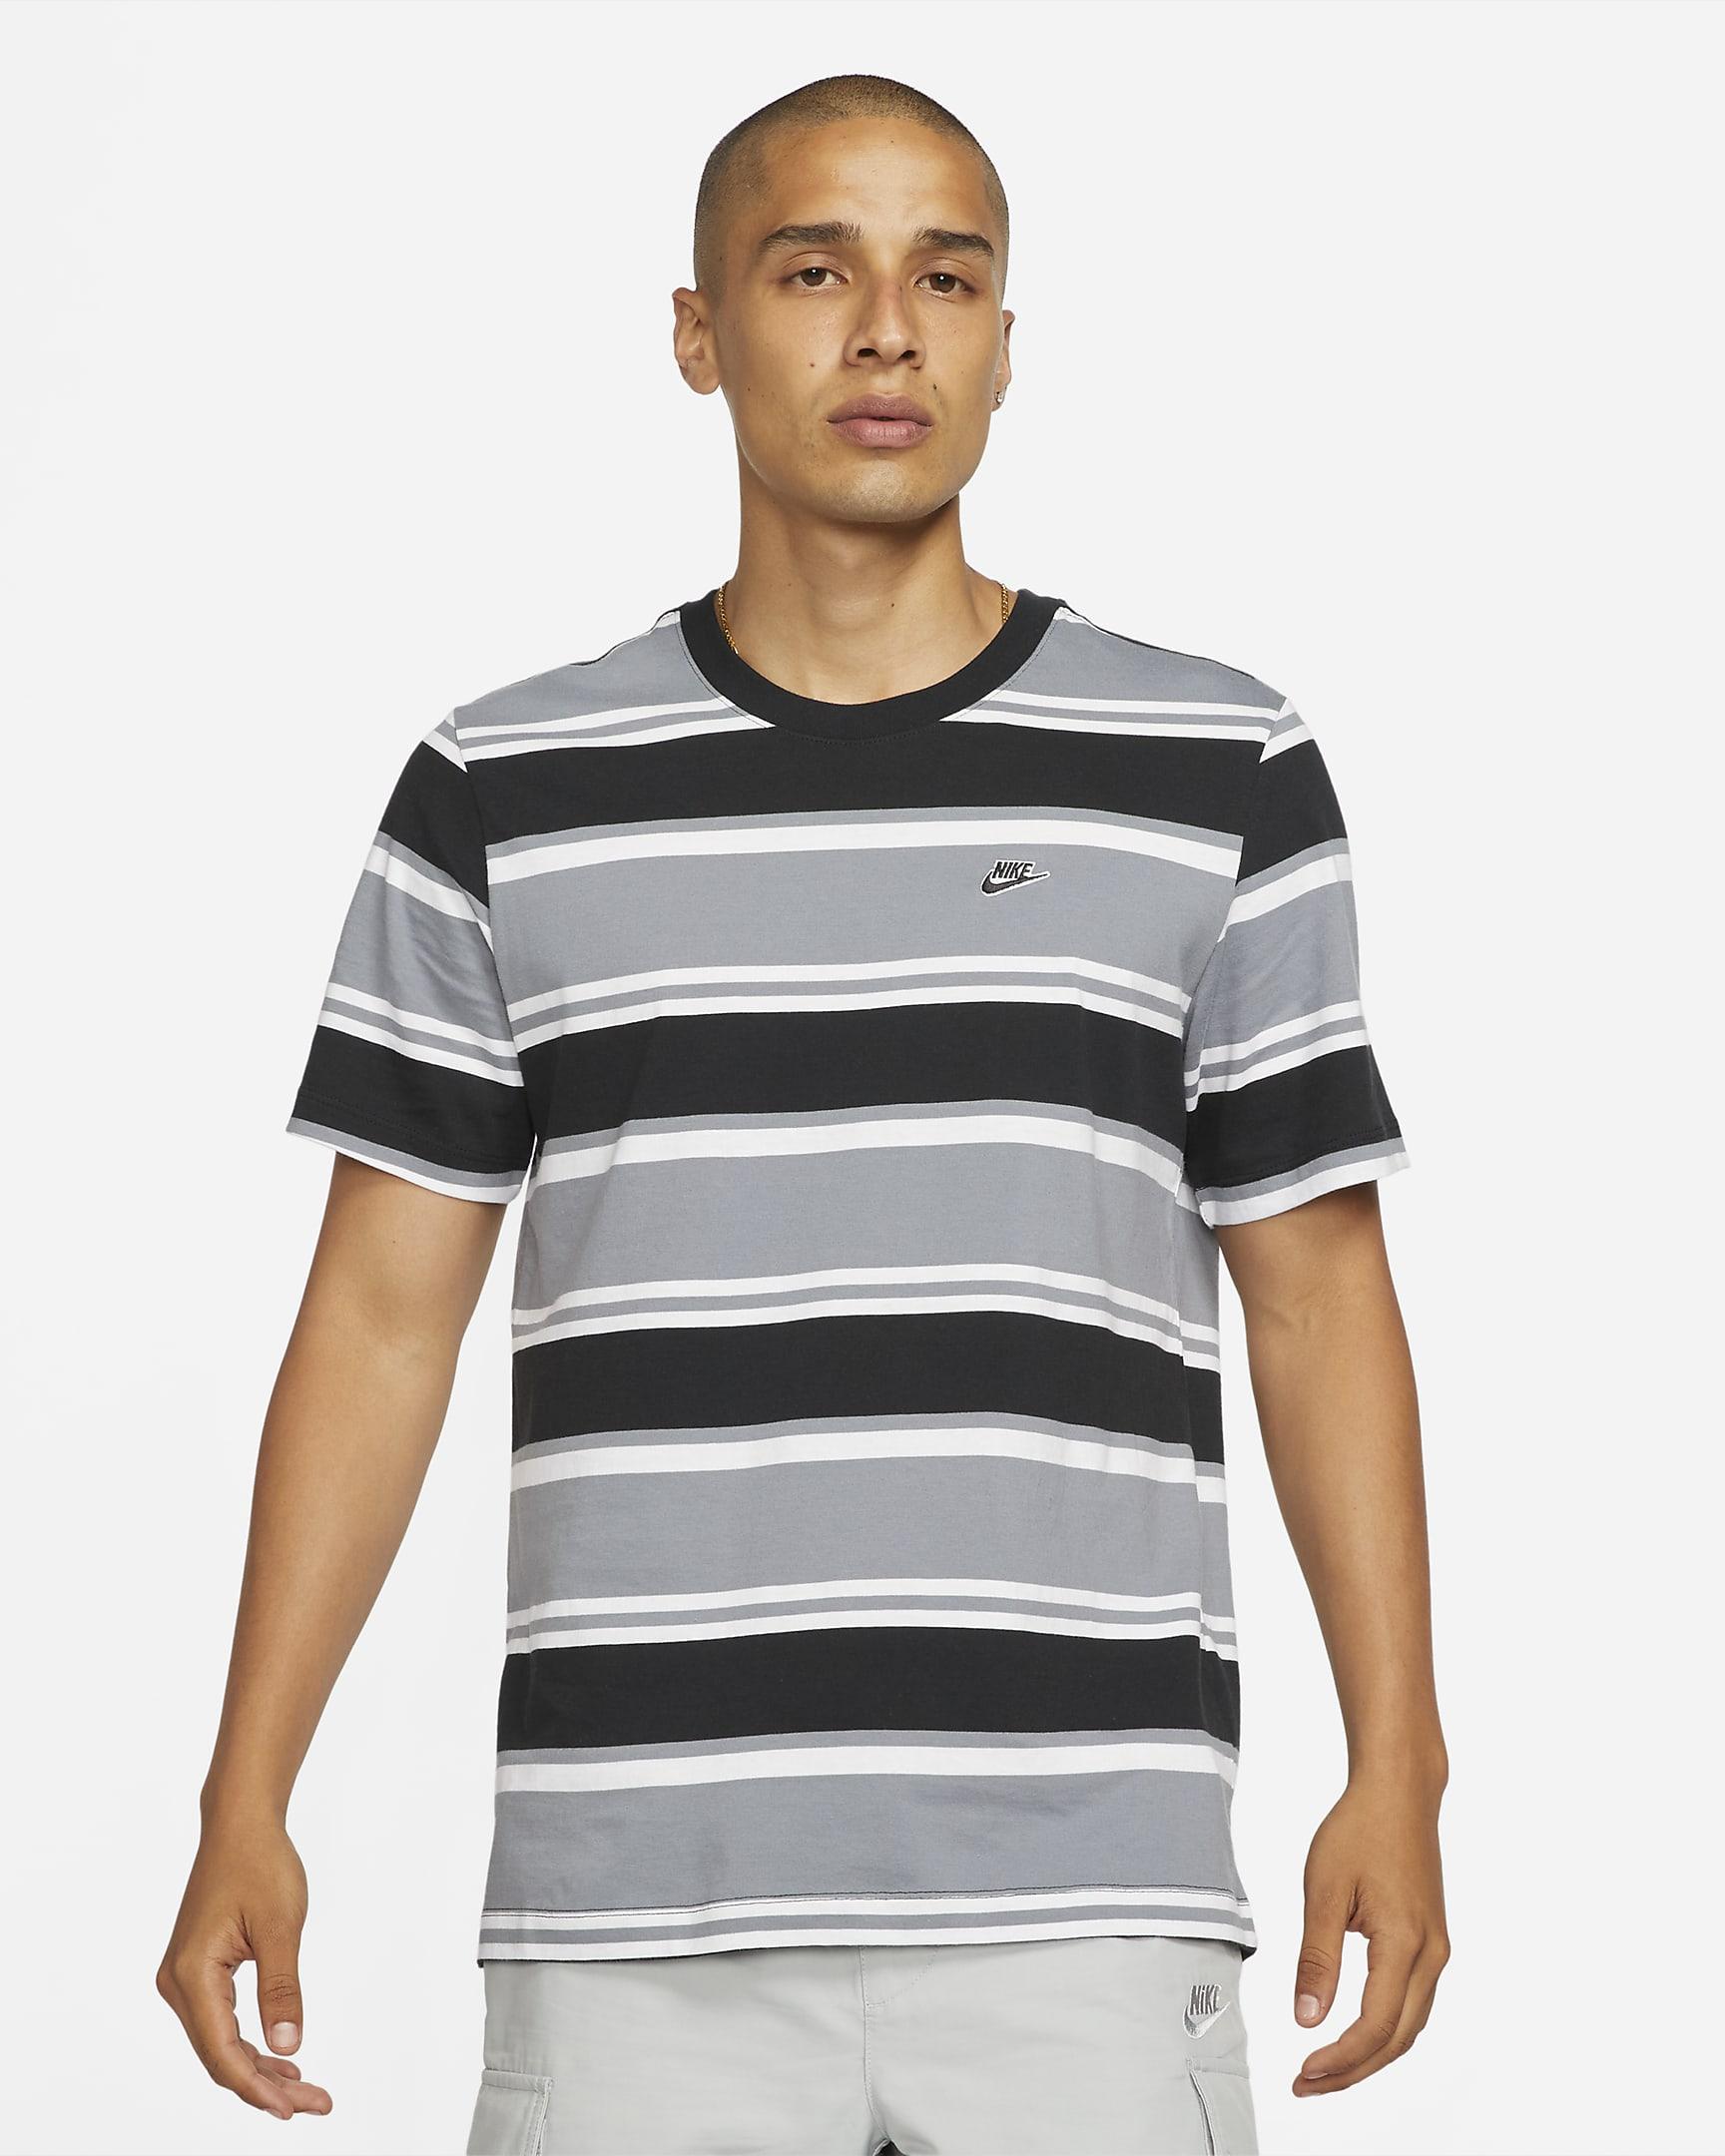 nike-sportswear-mens-stripe-t-shirt-sbl16m.png